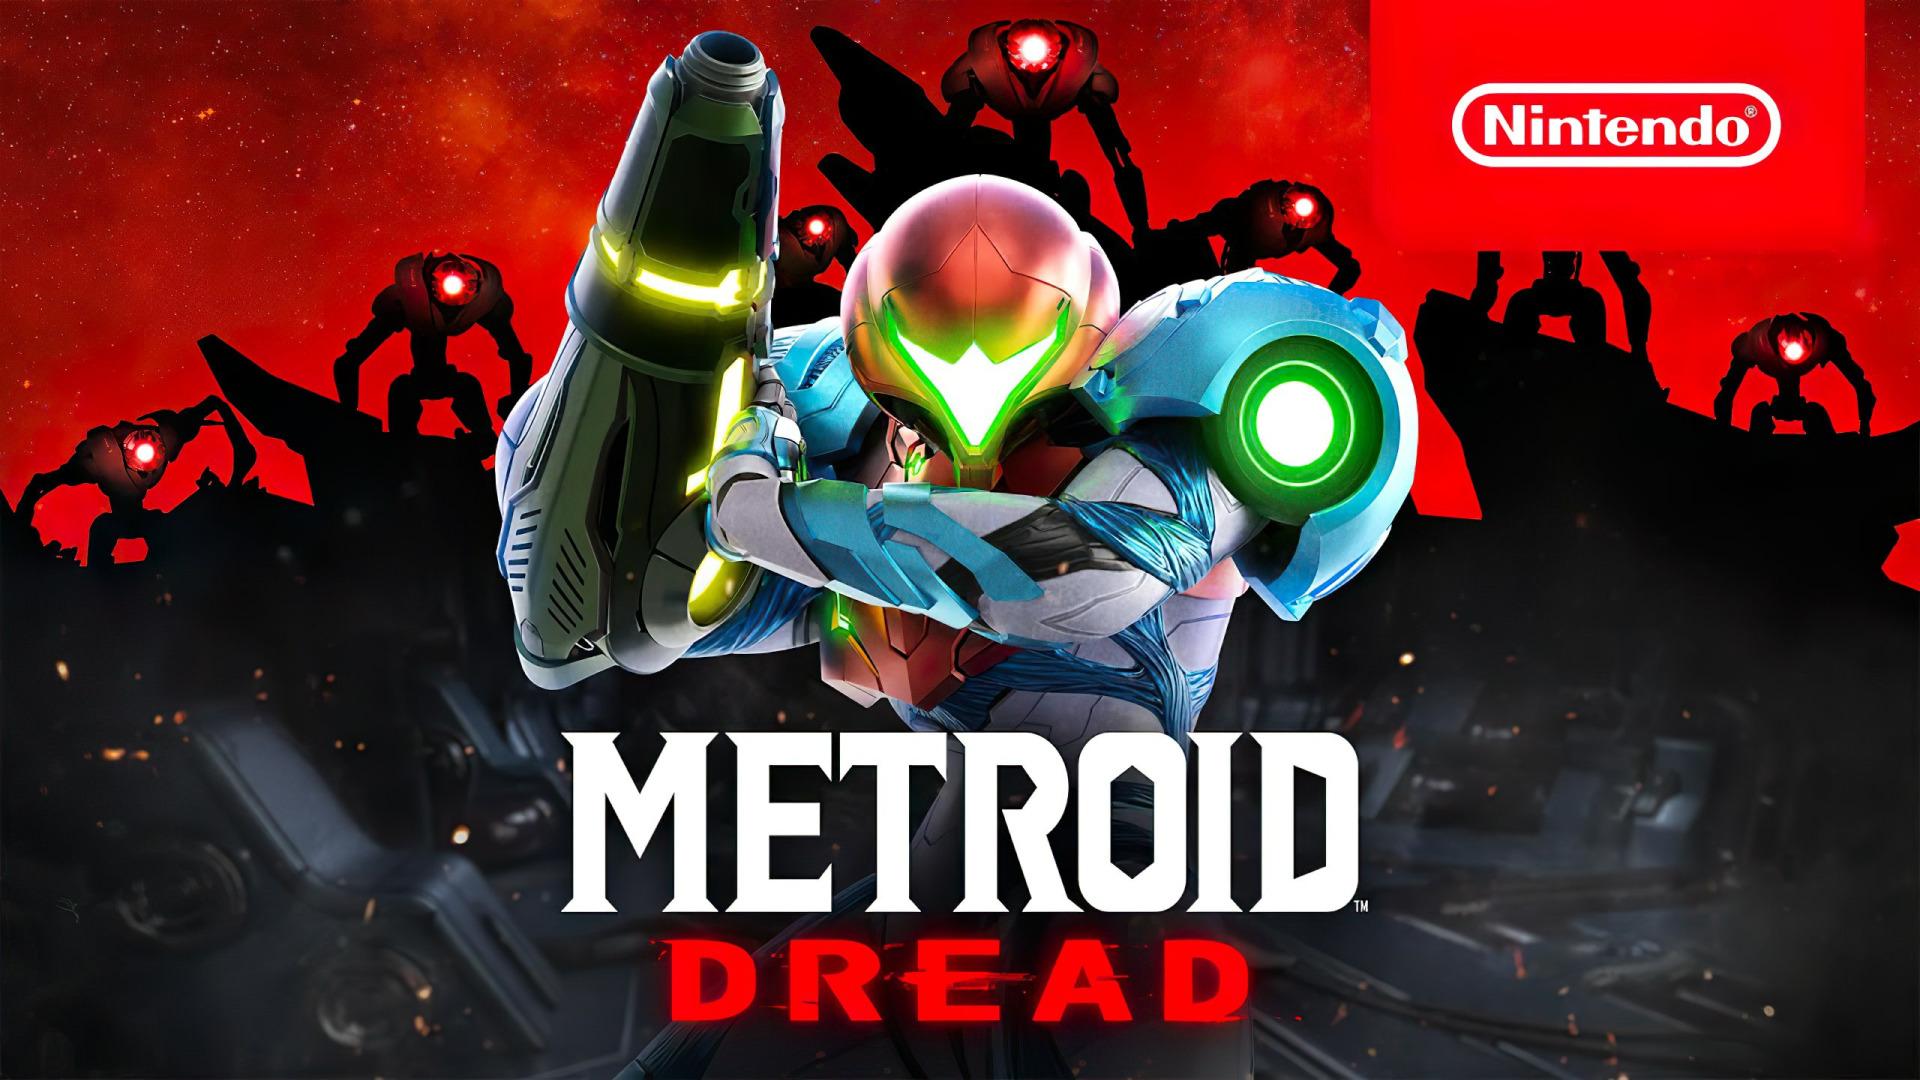 Trailer, Nintendo, Nintendo Switch, Switch, Metroid, Metroid Dread